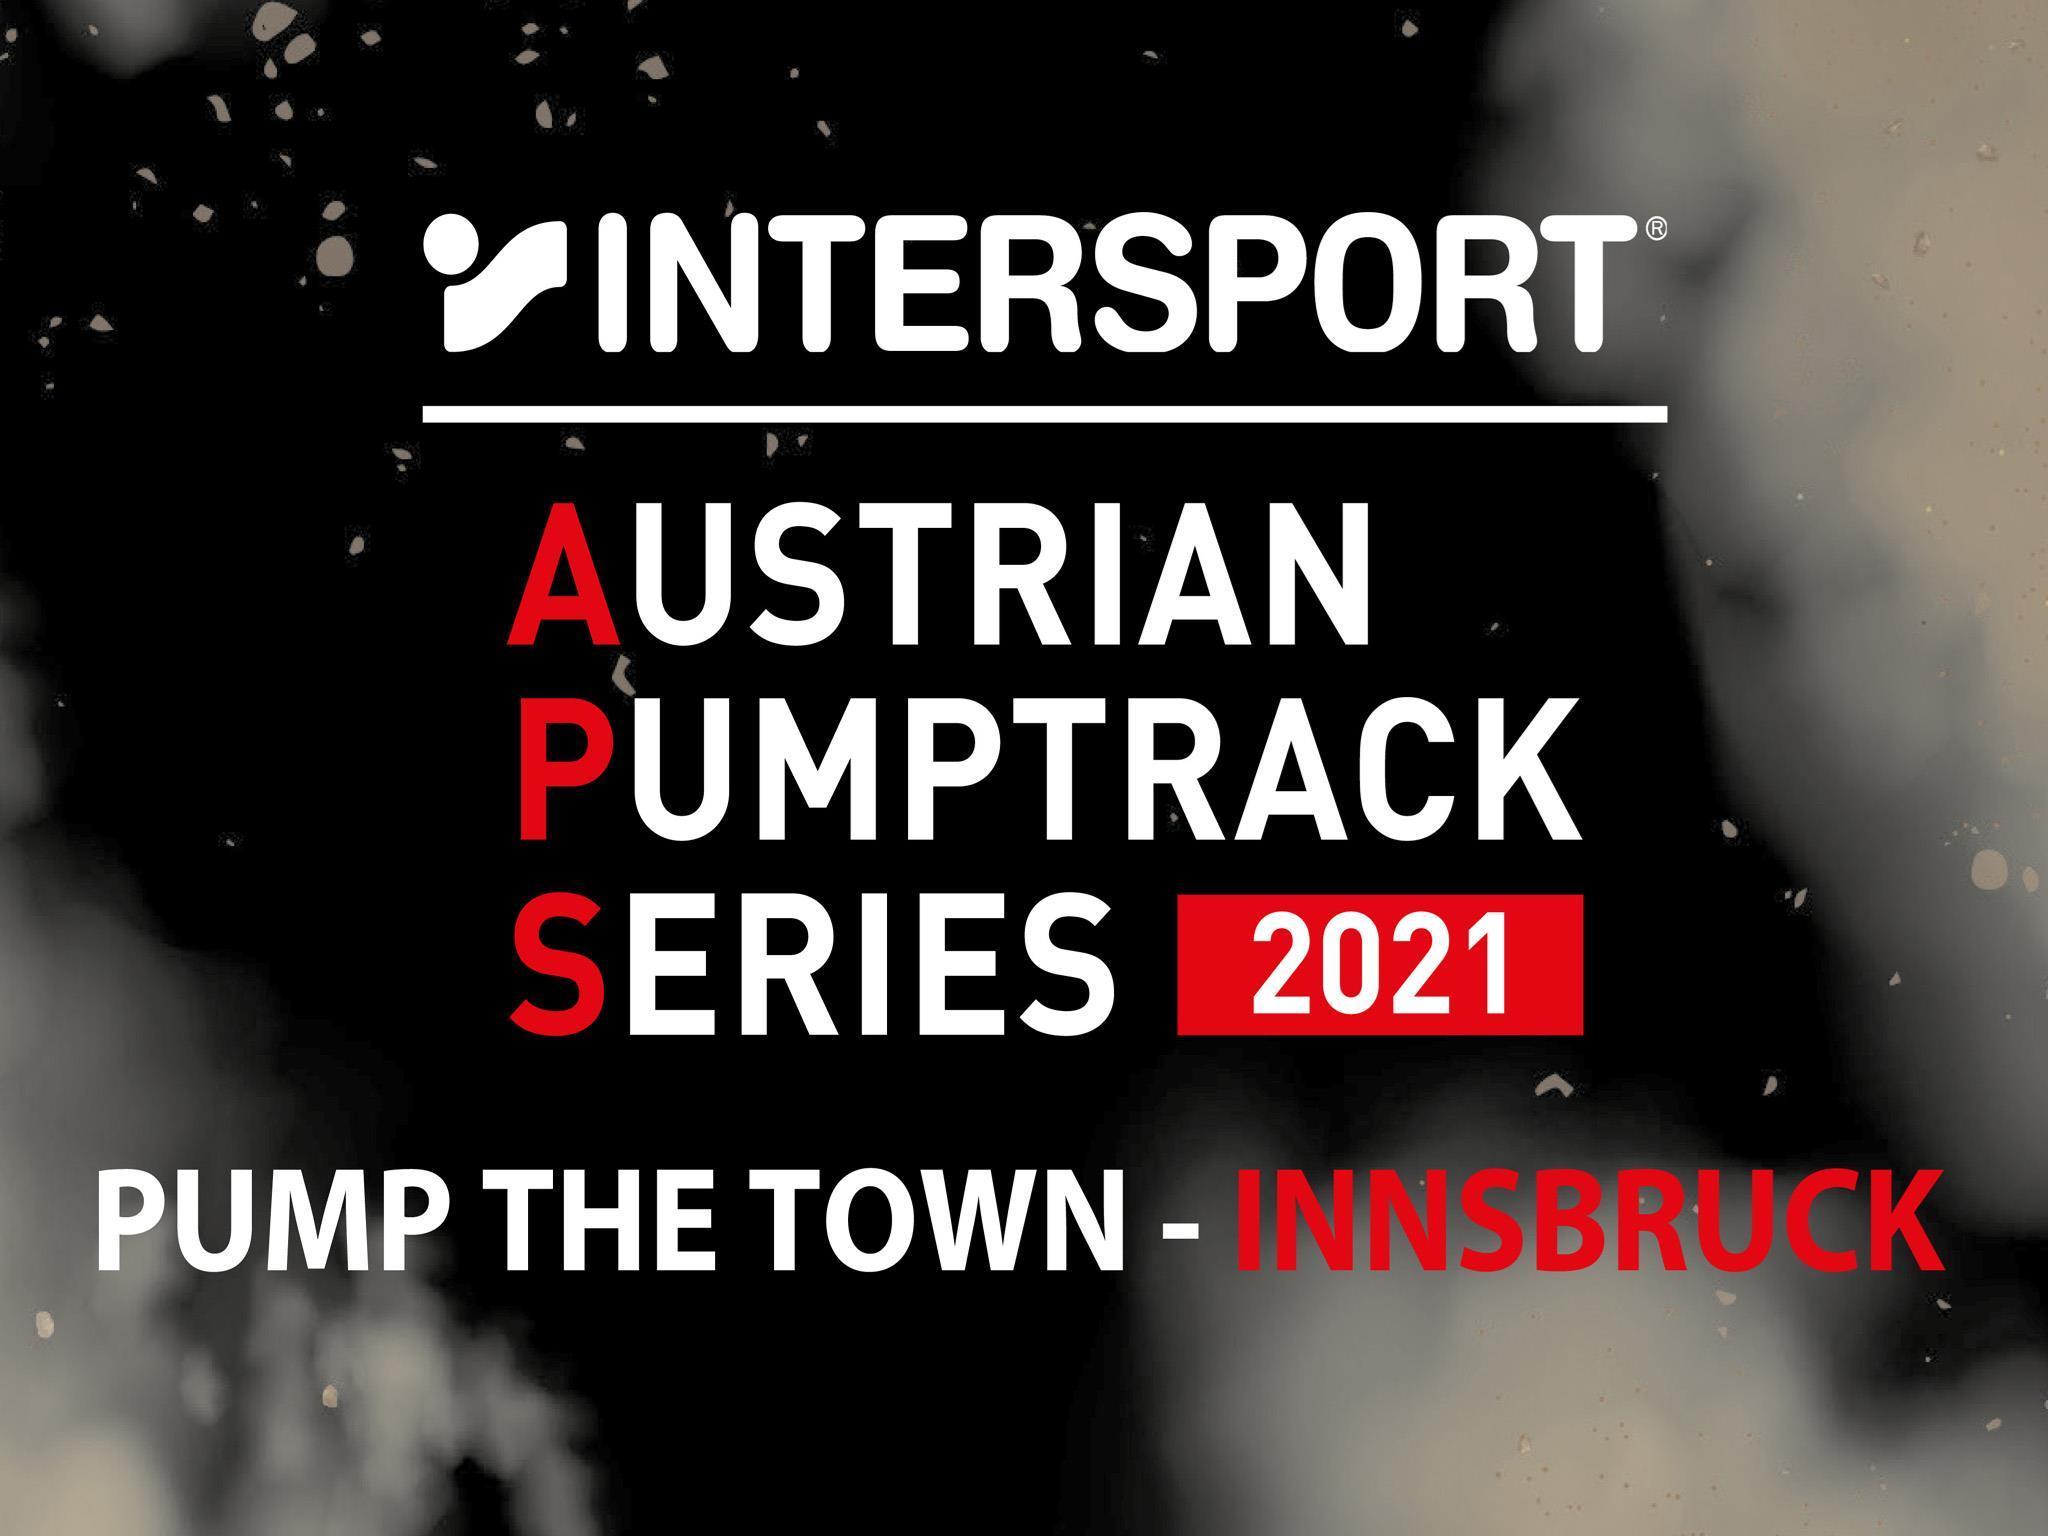 INTERSPORT Austian Pumptrack Series 2021